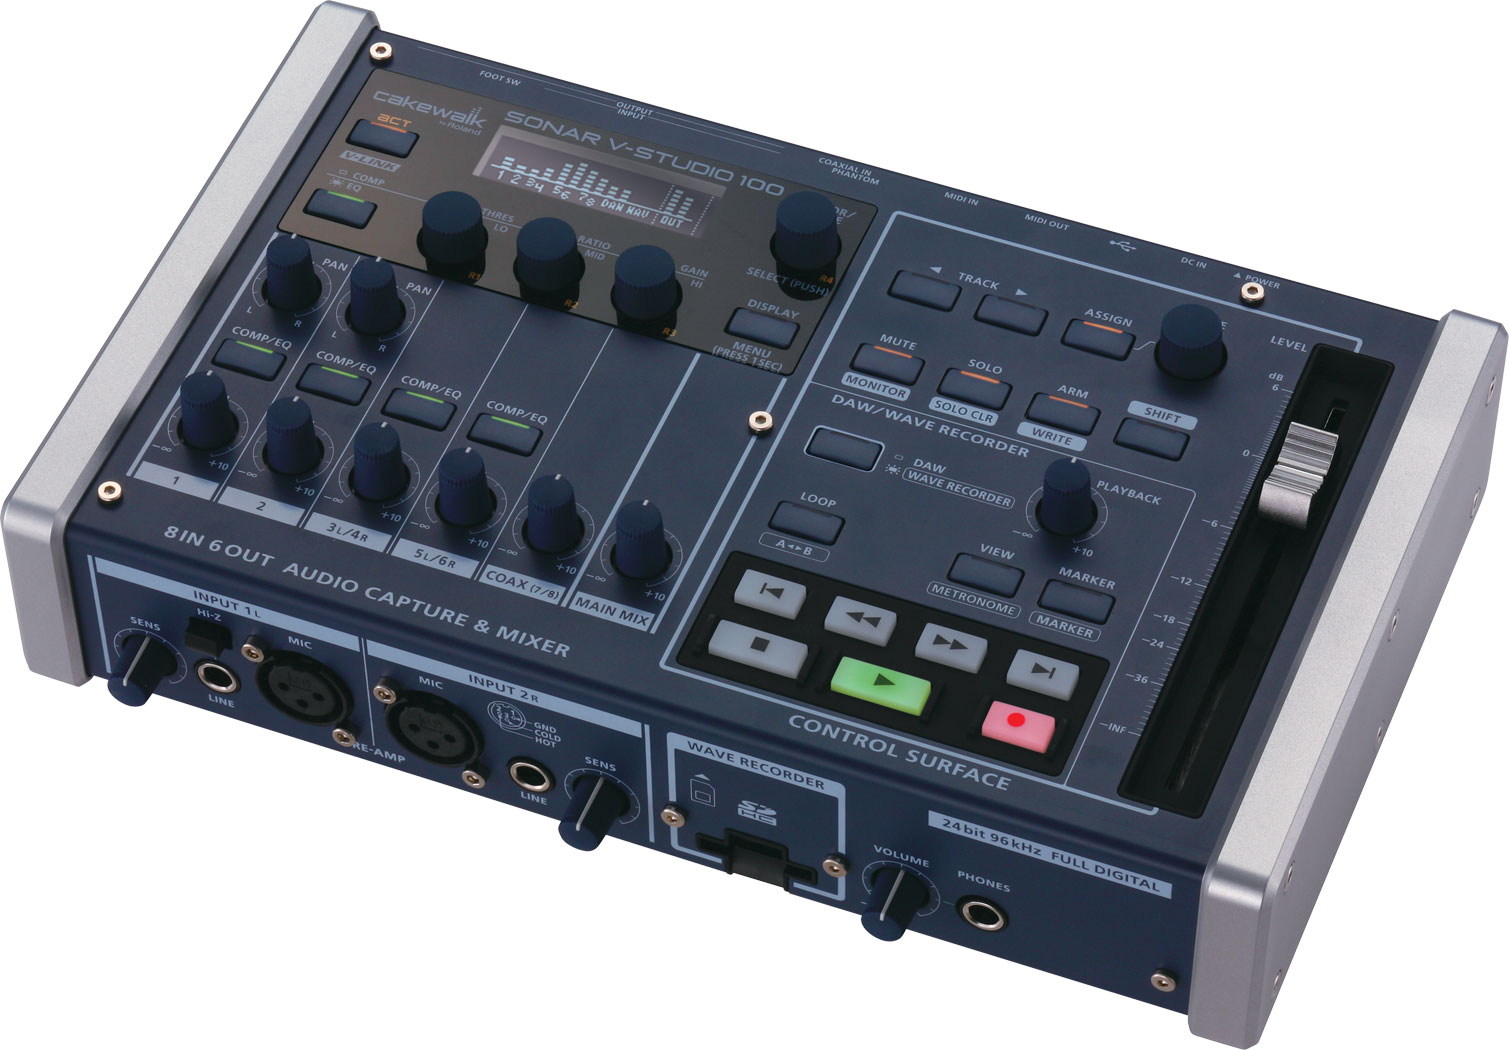 Roland - V-STUDIO 100 | Portable Music Production Studio